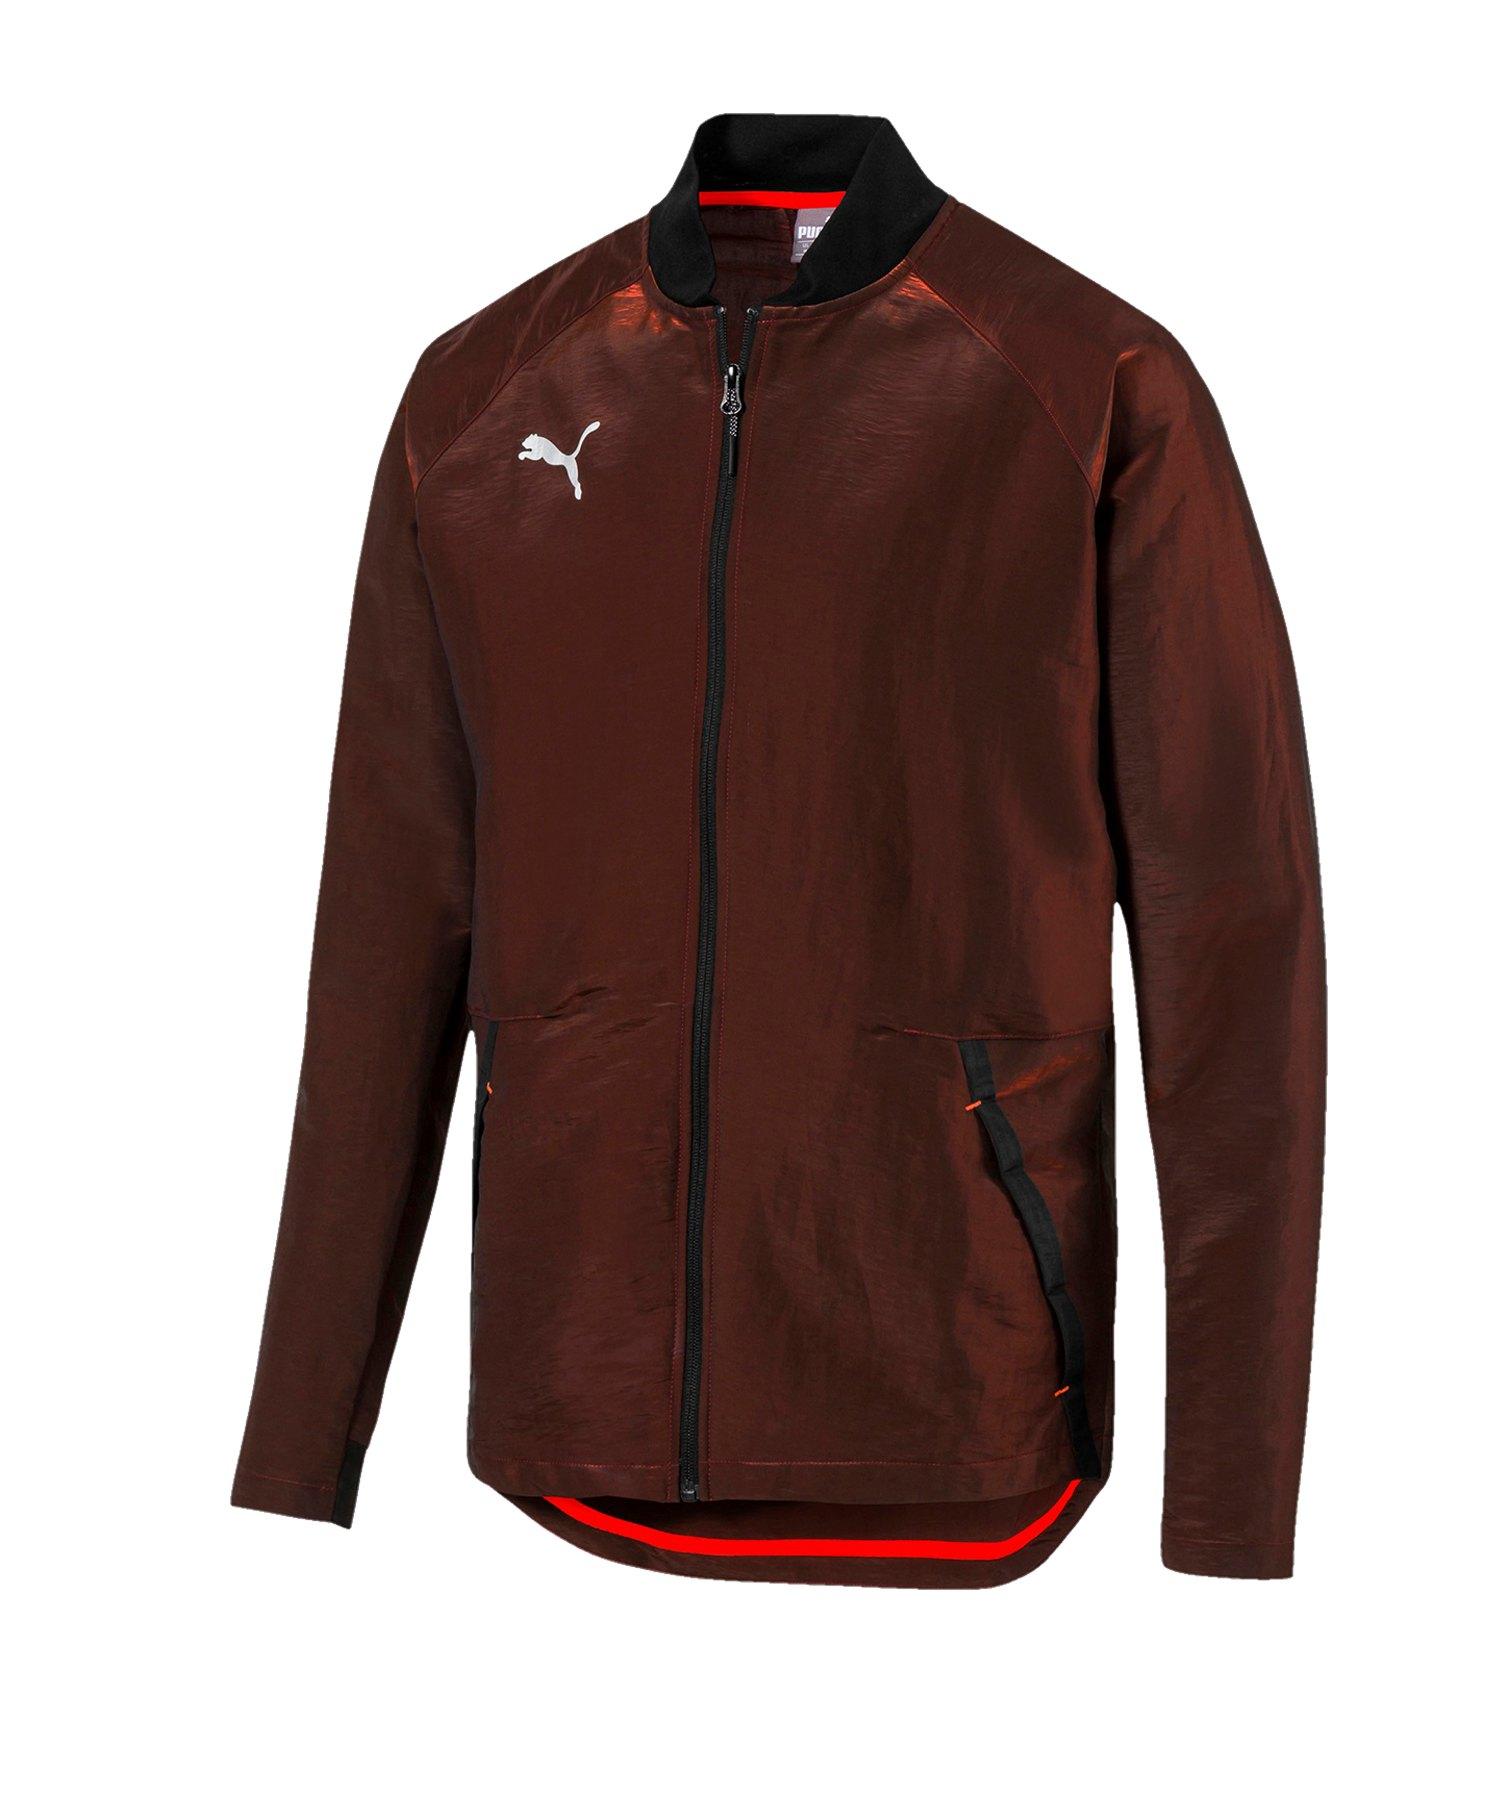 PUMA ftblNXT Pro Jacket Jacke Rot Schwarz F01 - rot